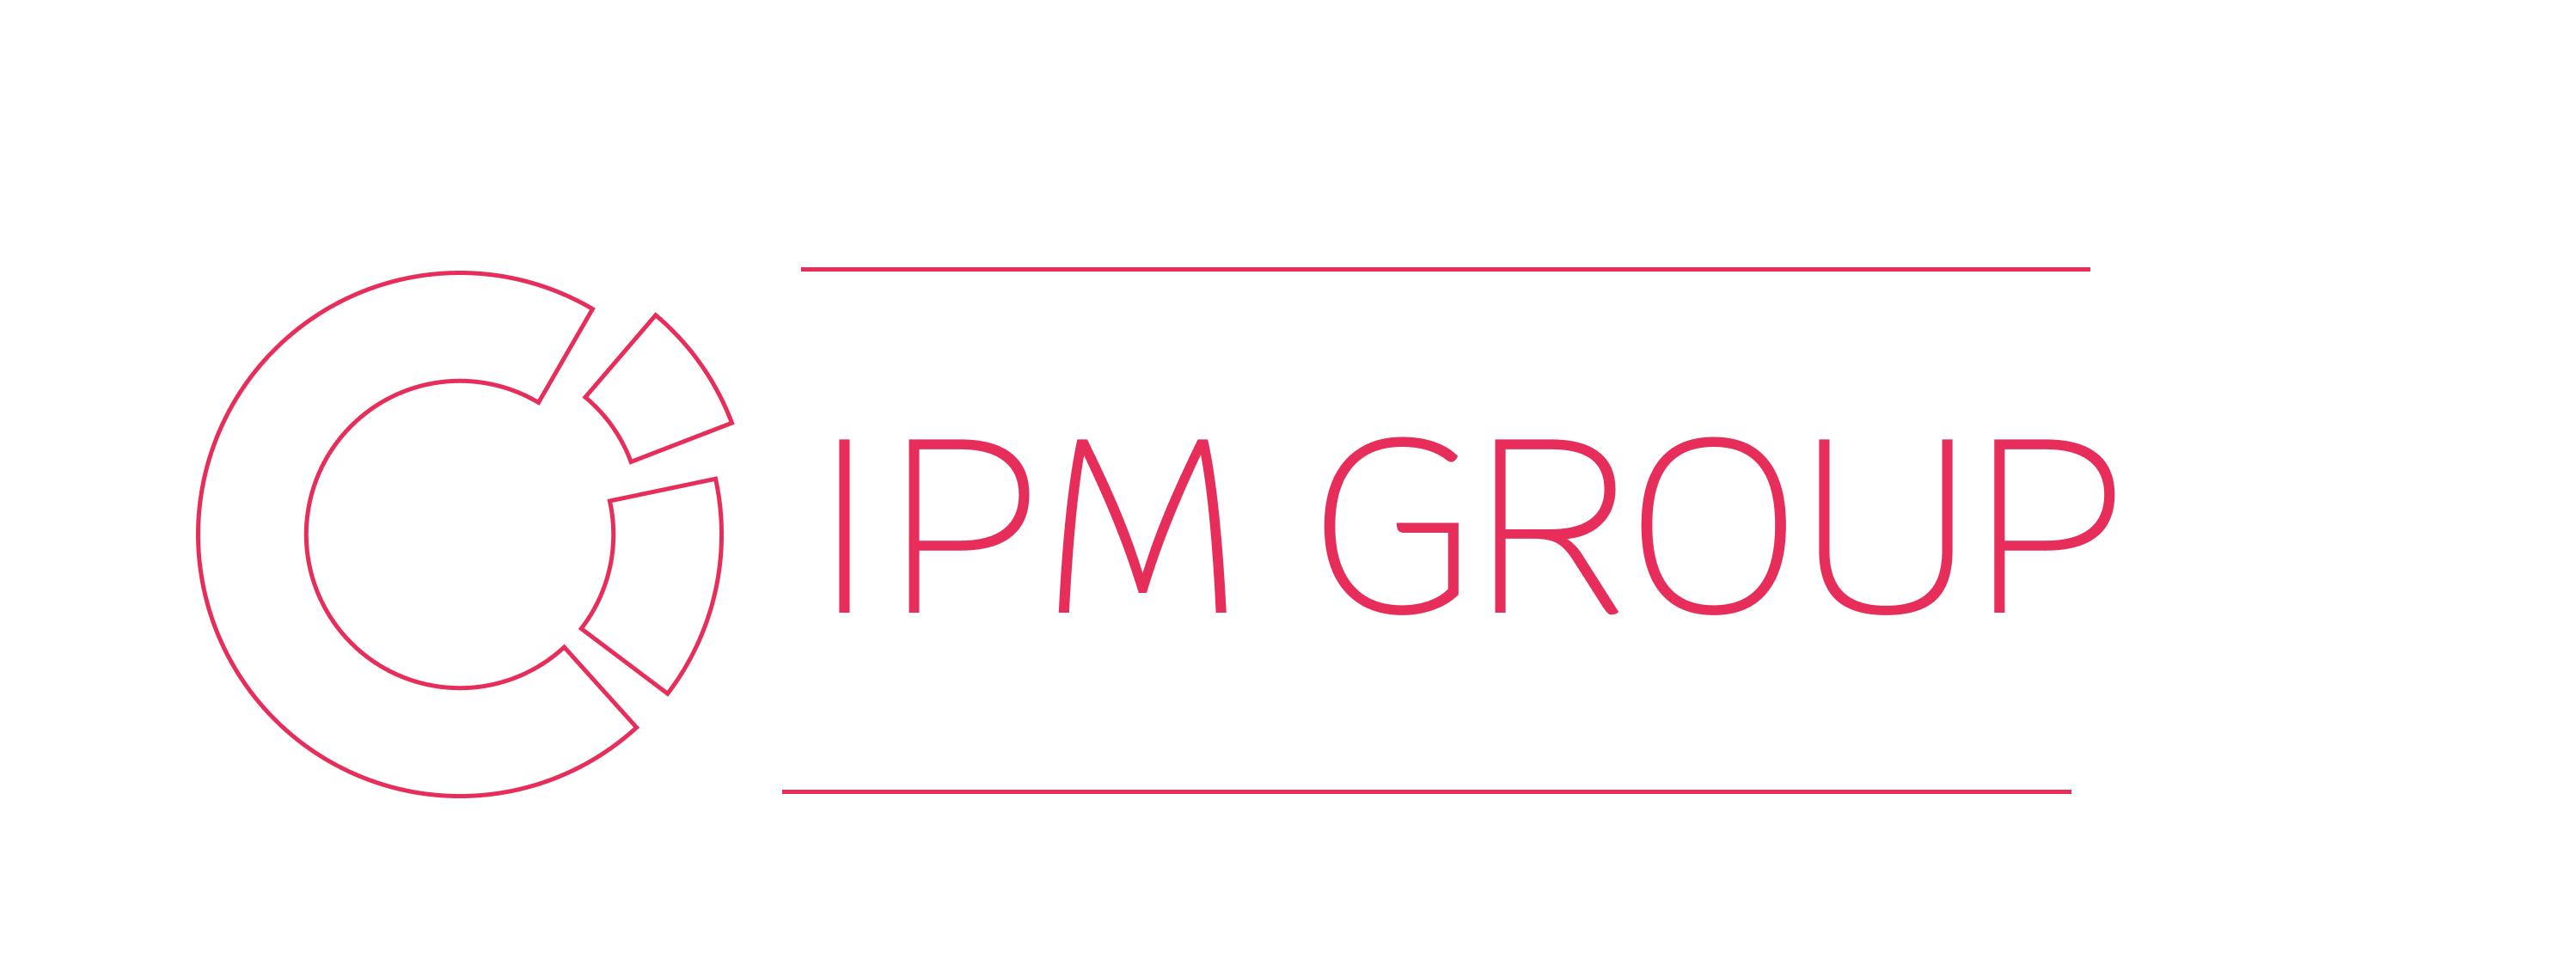 Разработка логотипа для управляющей компании фото f_3725f82c104303b6.png